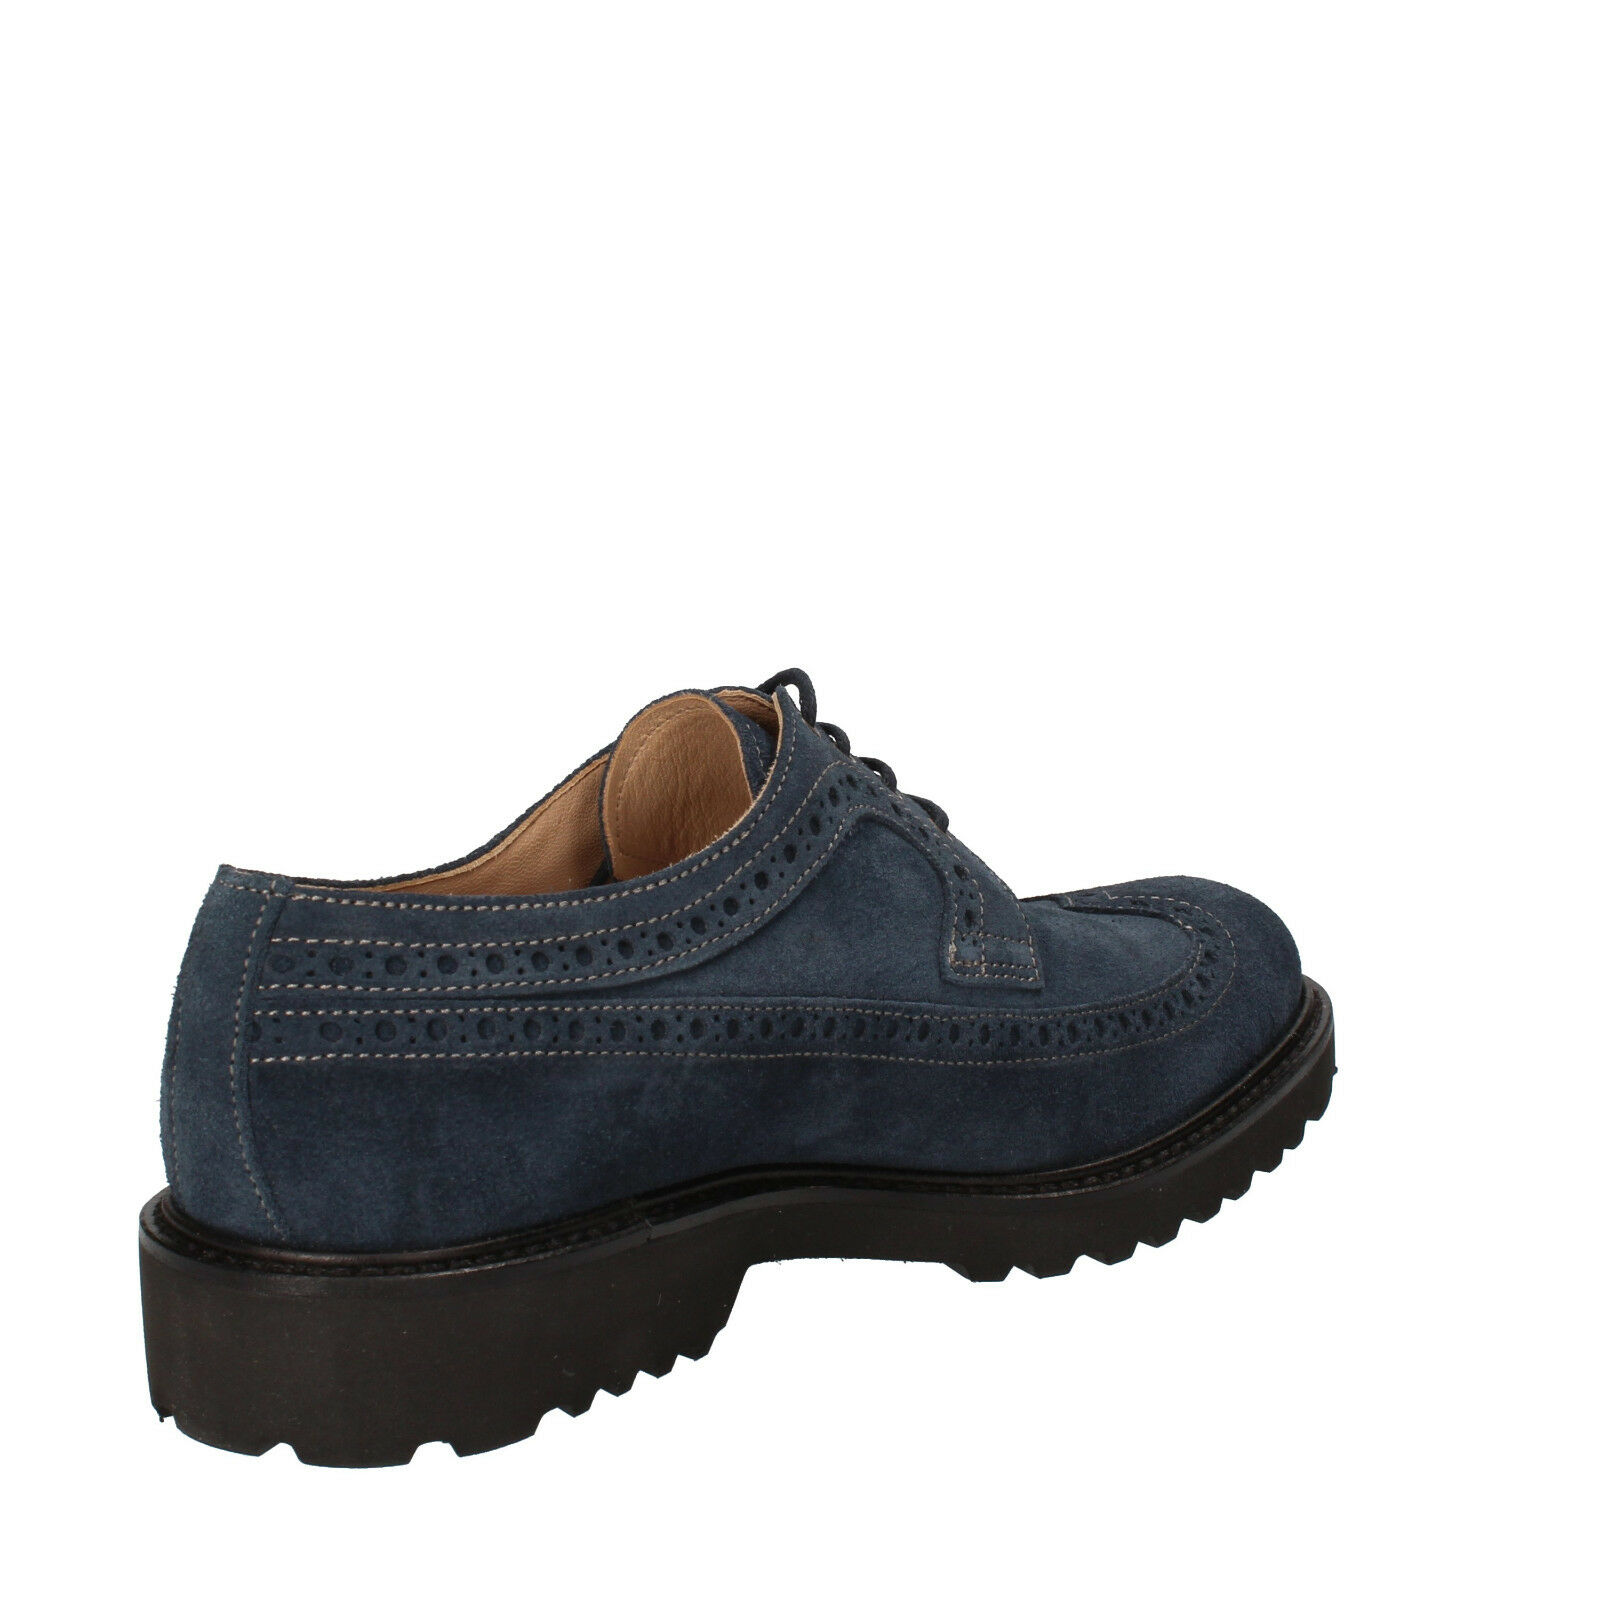 Scarpe casual da uomo  Scarpe DA (EU UOMO EVOLUZION 6 (EU DA 40) Elegante/Oxford-Scarpe Blue Suede AD260-C 0b106e